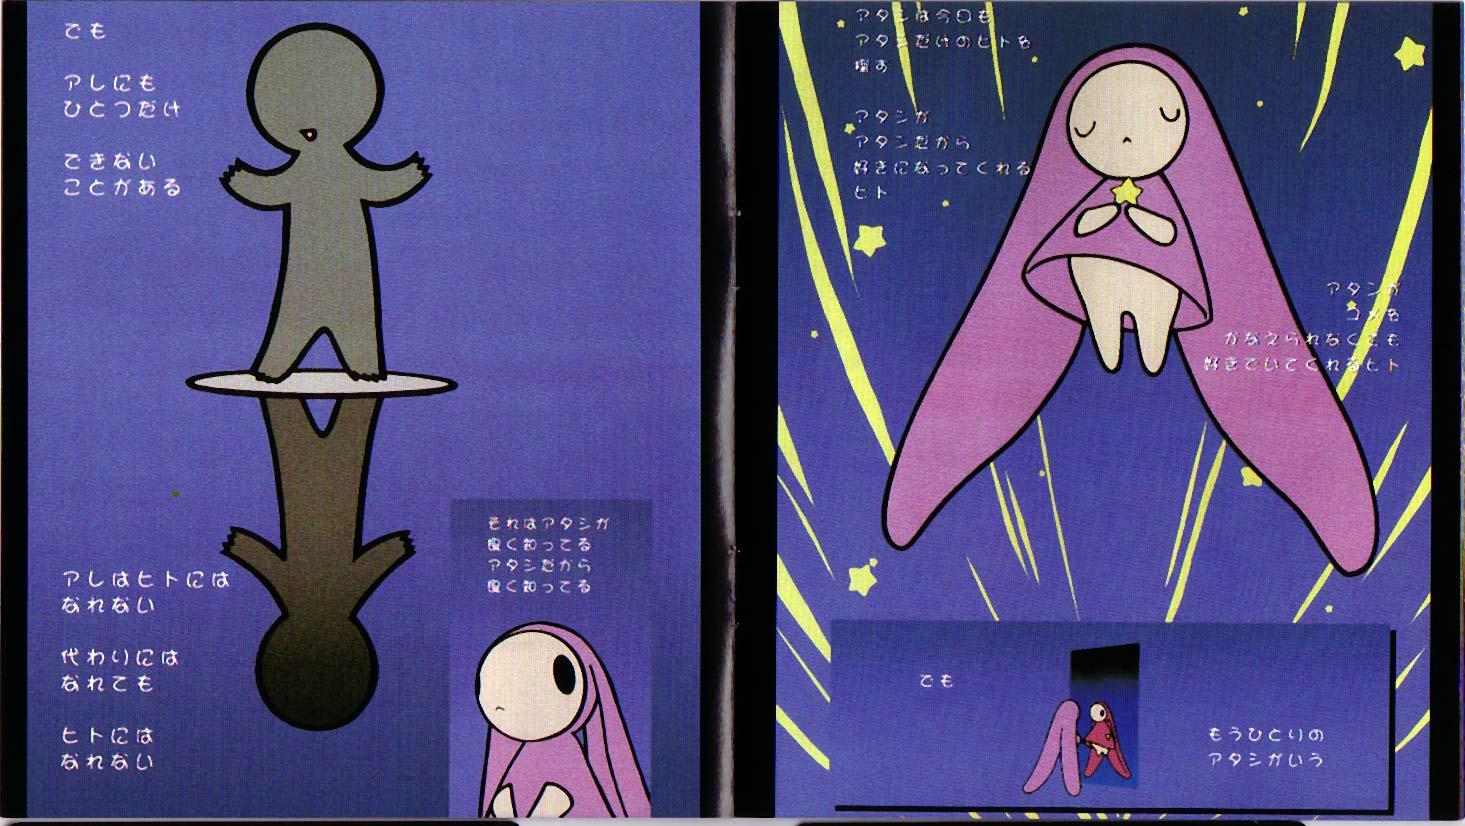 Tags Anime CLAMP Chobits Atashi City With No People